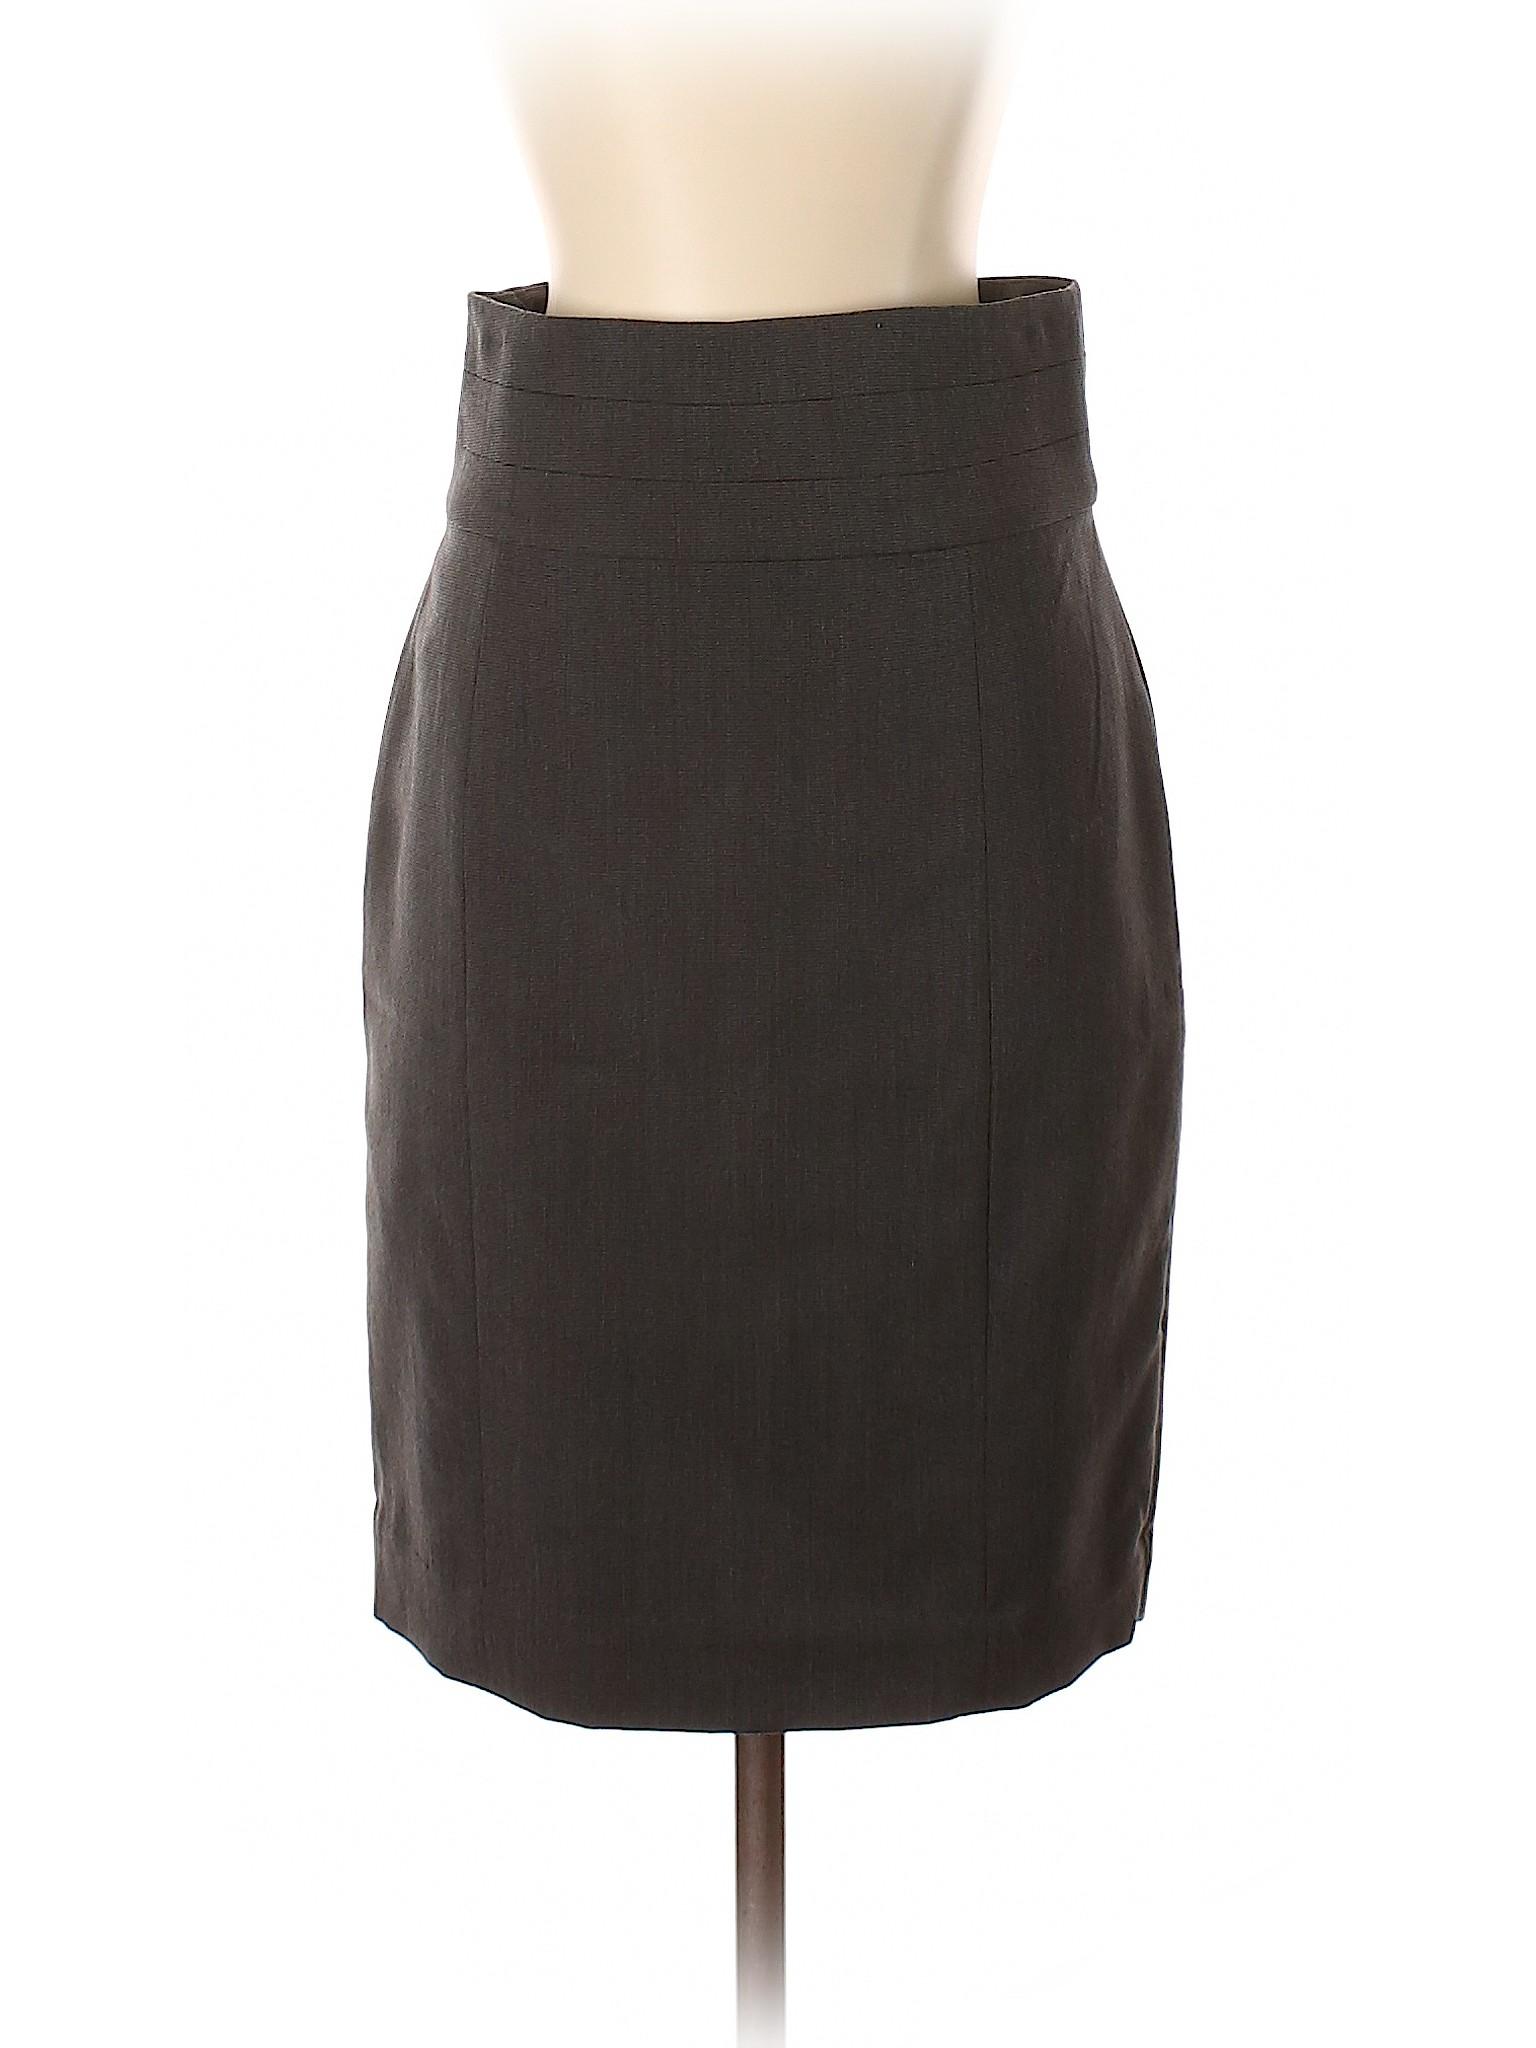 Casual Boutique Boutique Casual Boutique Skirt Skirt Boutique Skirt Casual qRt4O